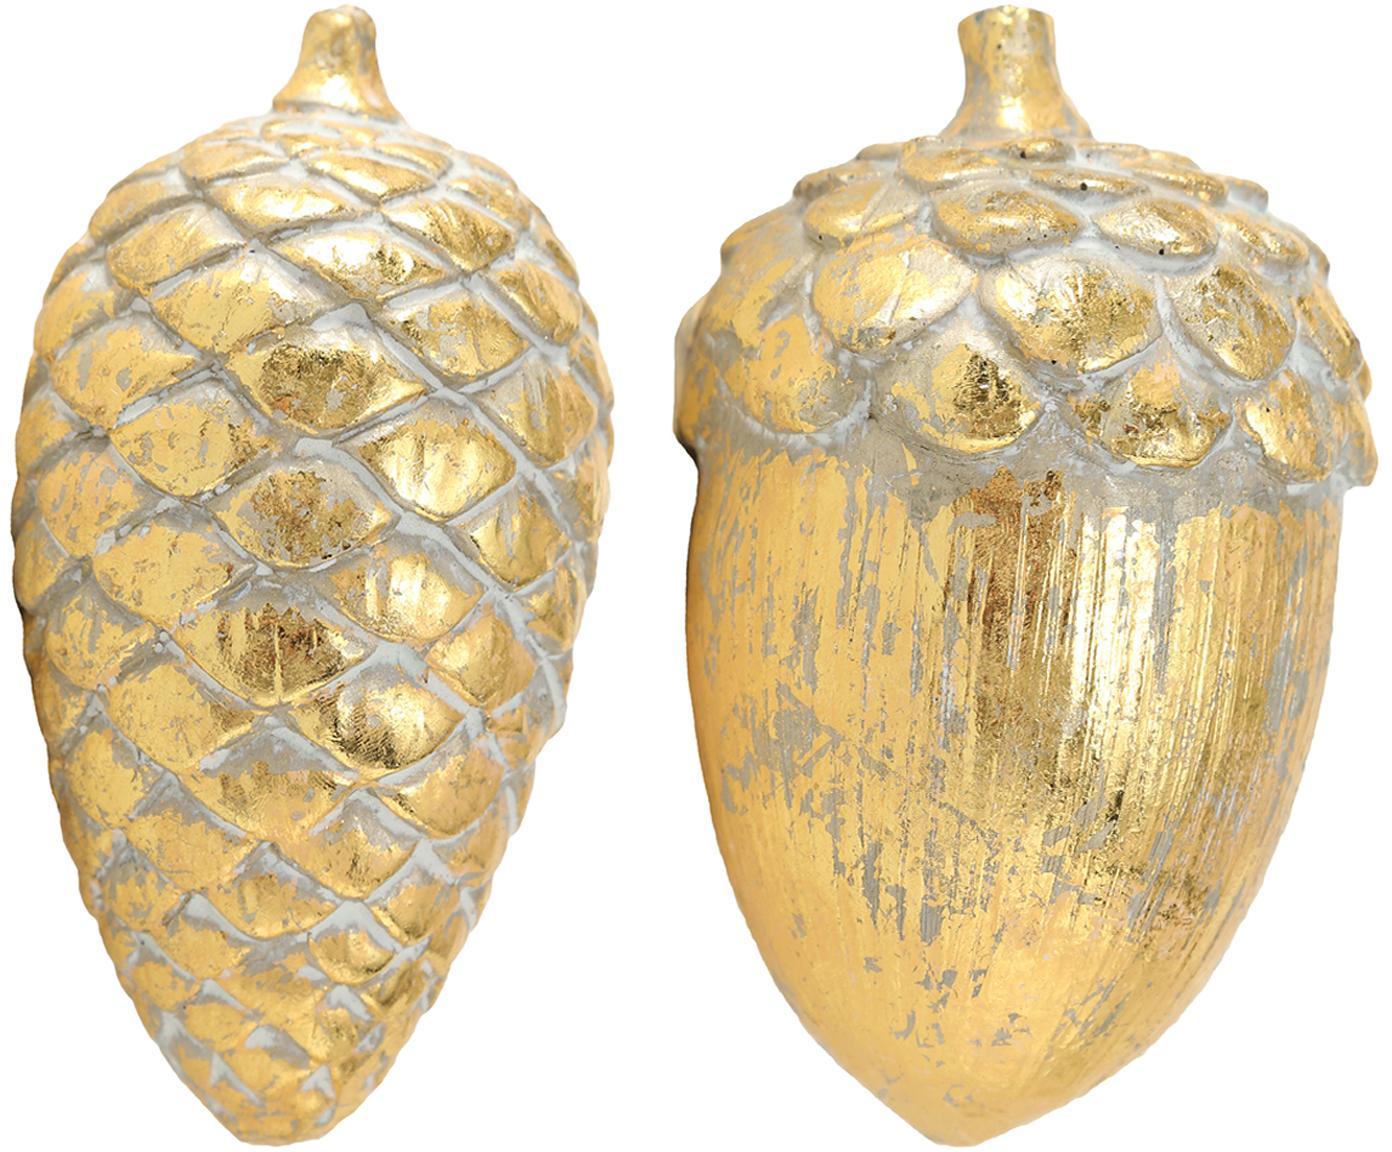 Deko-Objekt-Set Bacary, 2-tlg., Kunstharz, Goldfarben, Ø 8 x H 15 cm